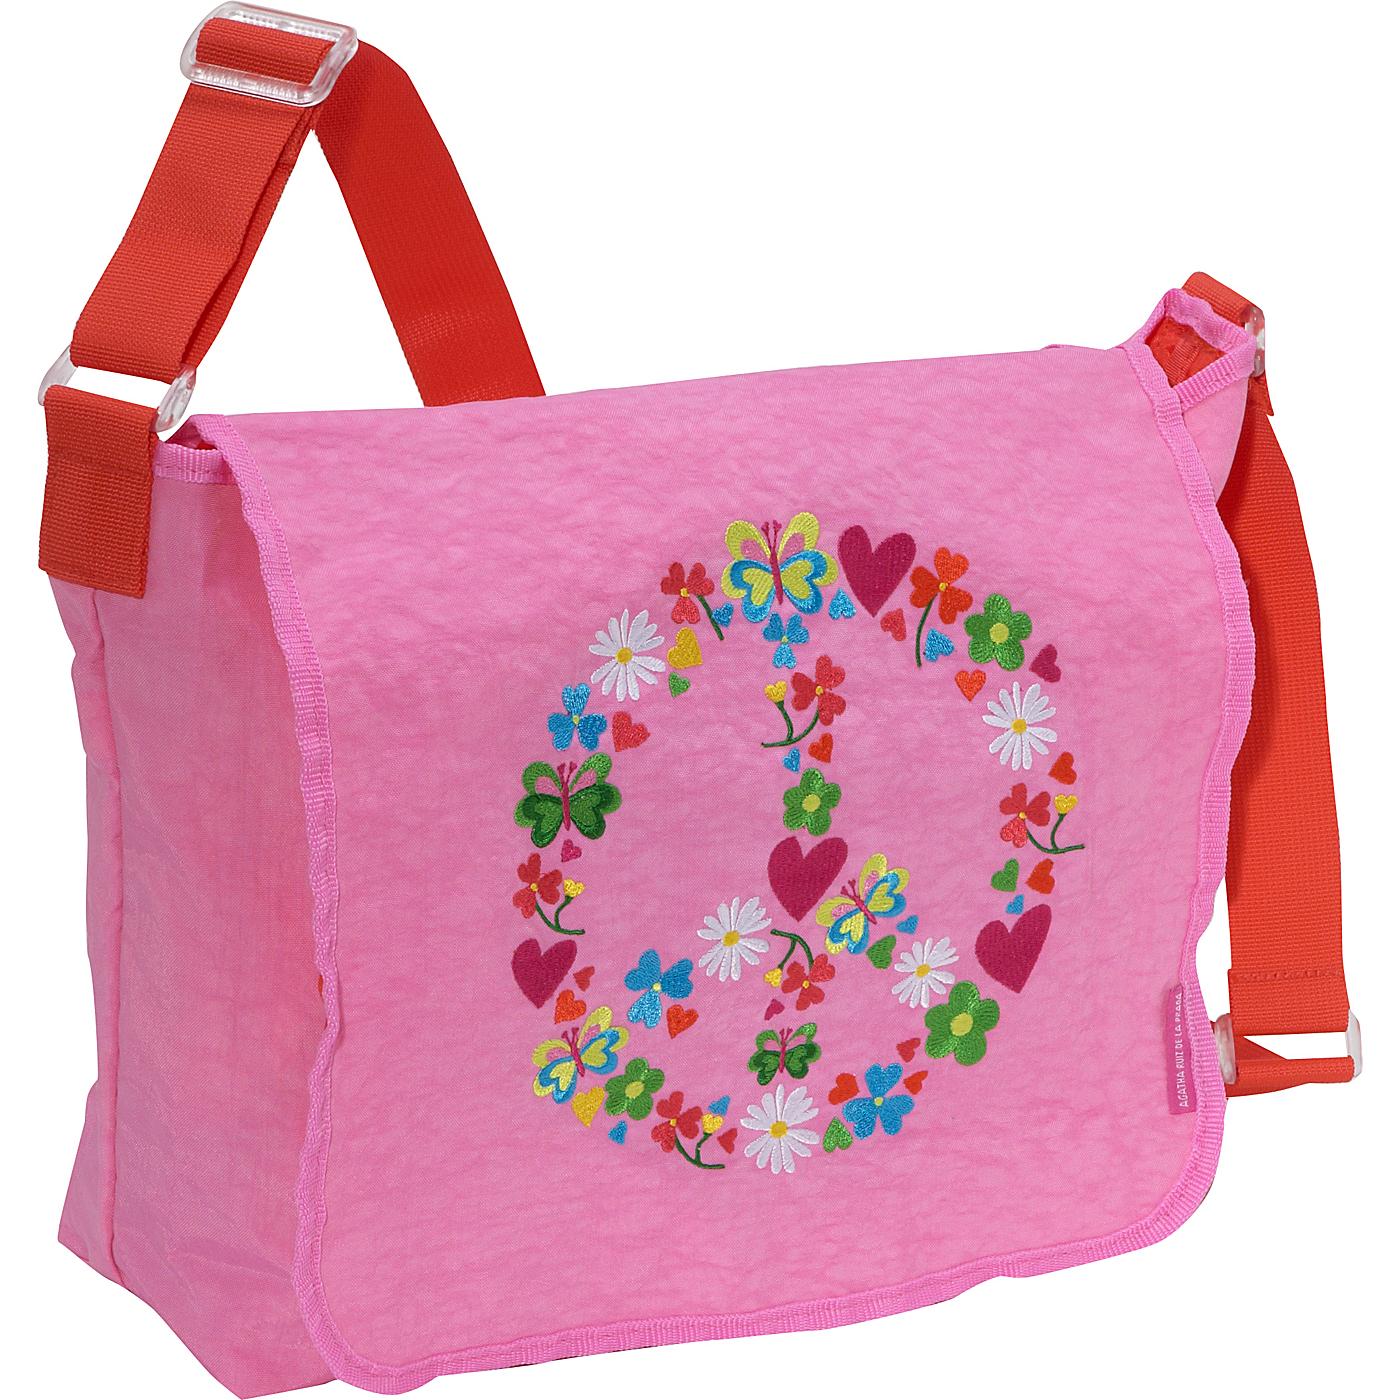 2767650d4e Miquelrius Agatha Ruiz de la Prada Peace   Love Pink Messenger Bag ...